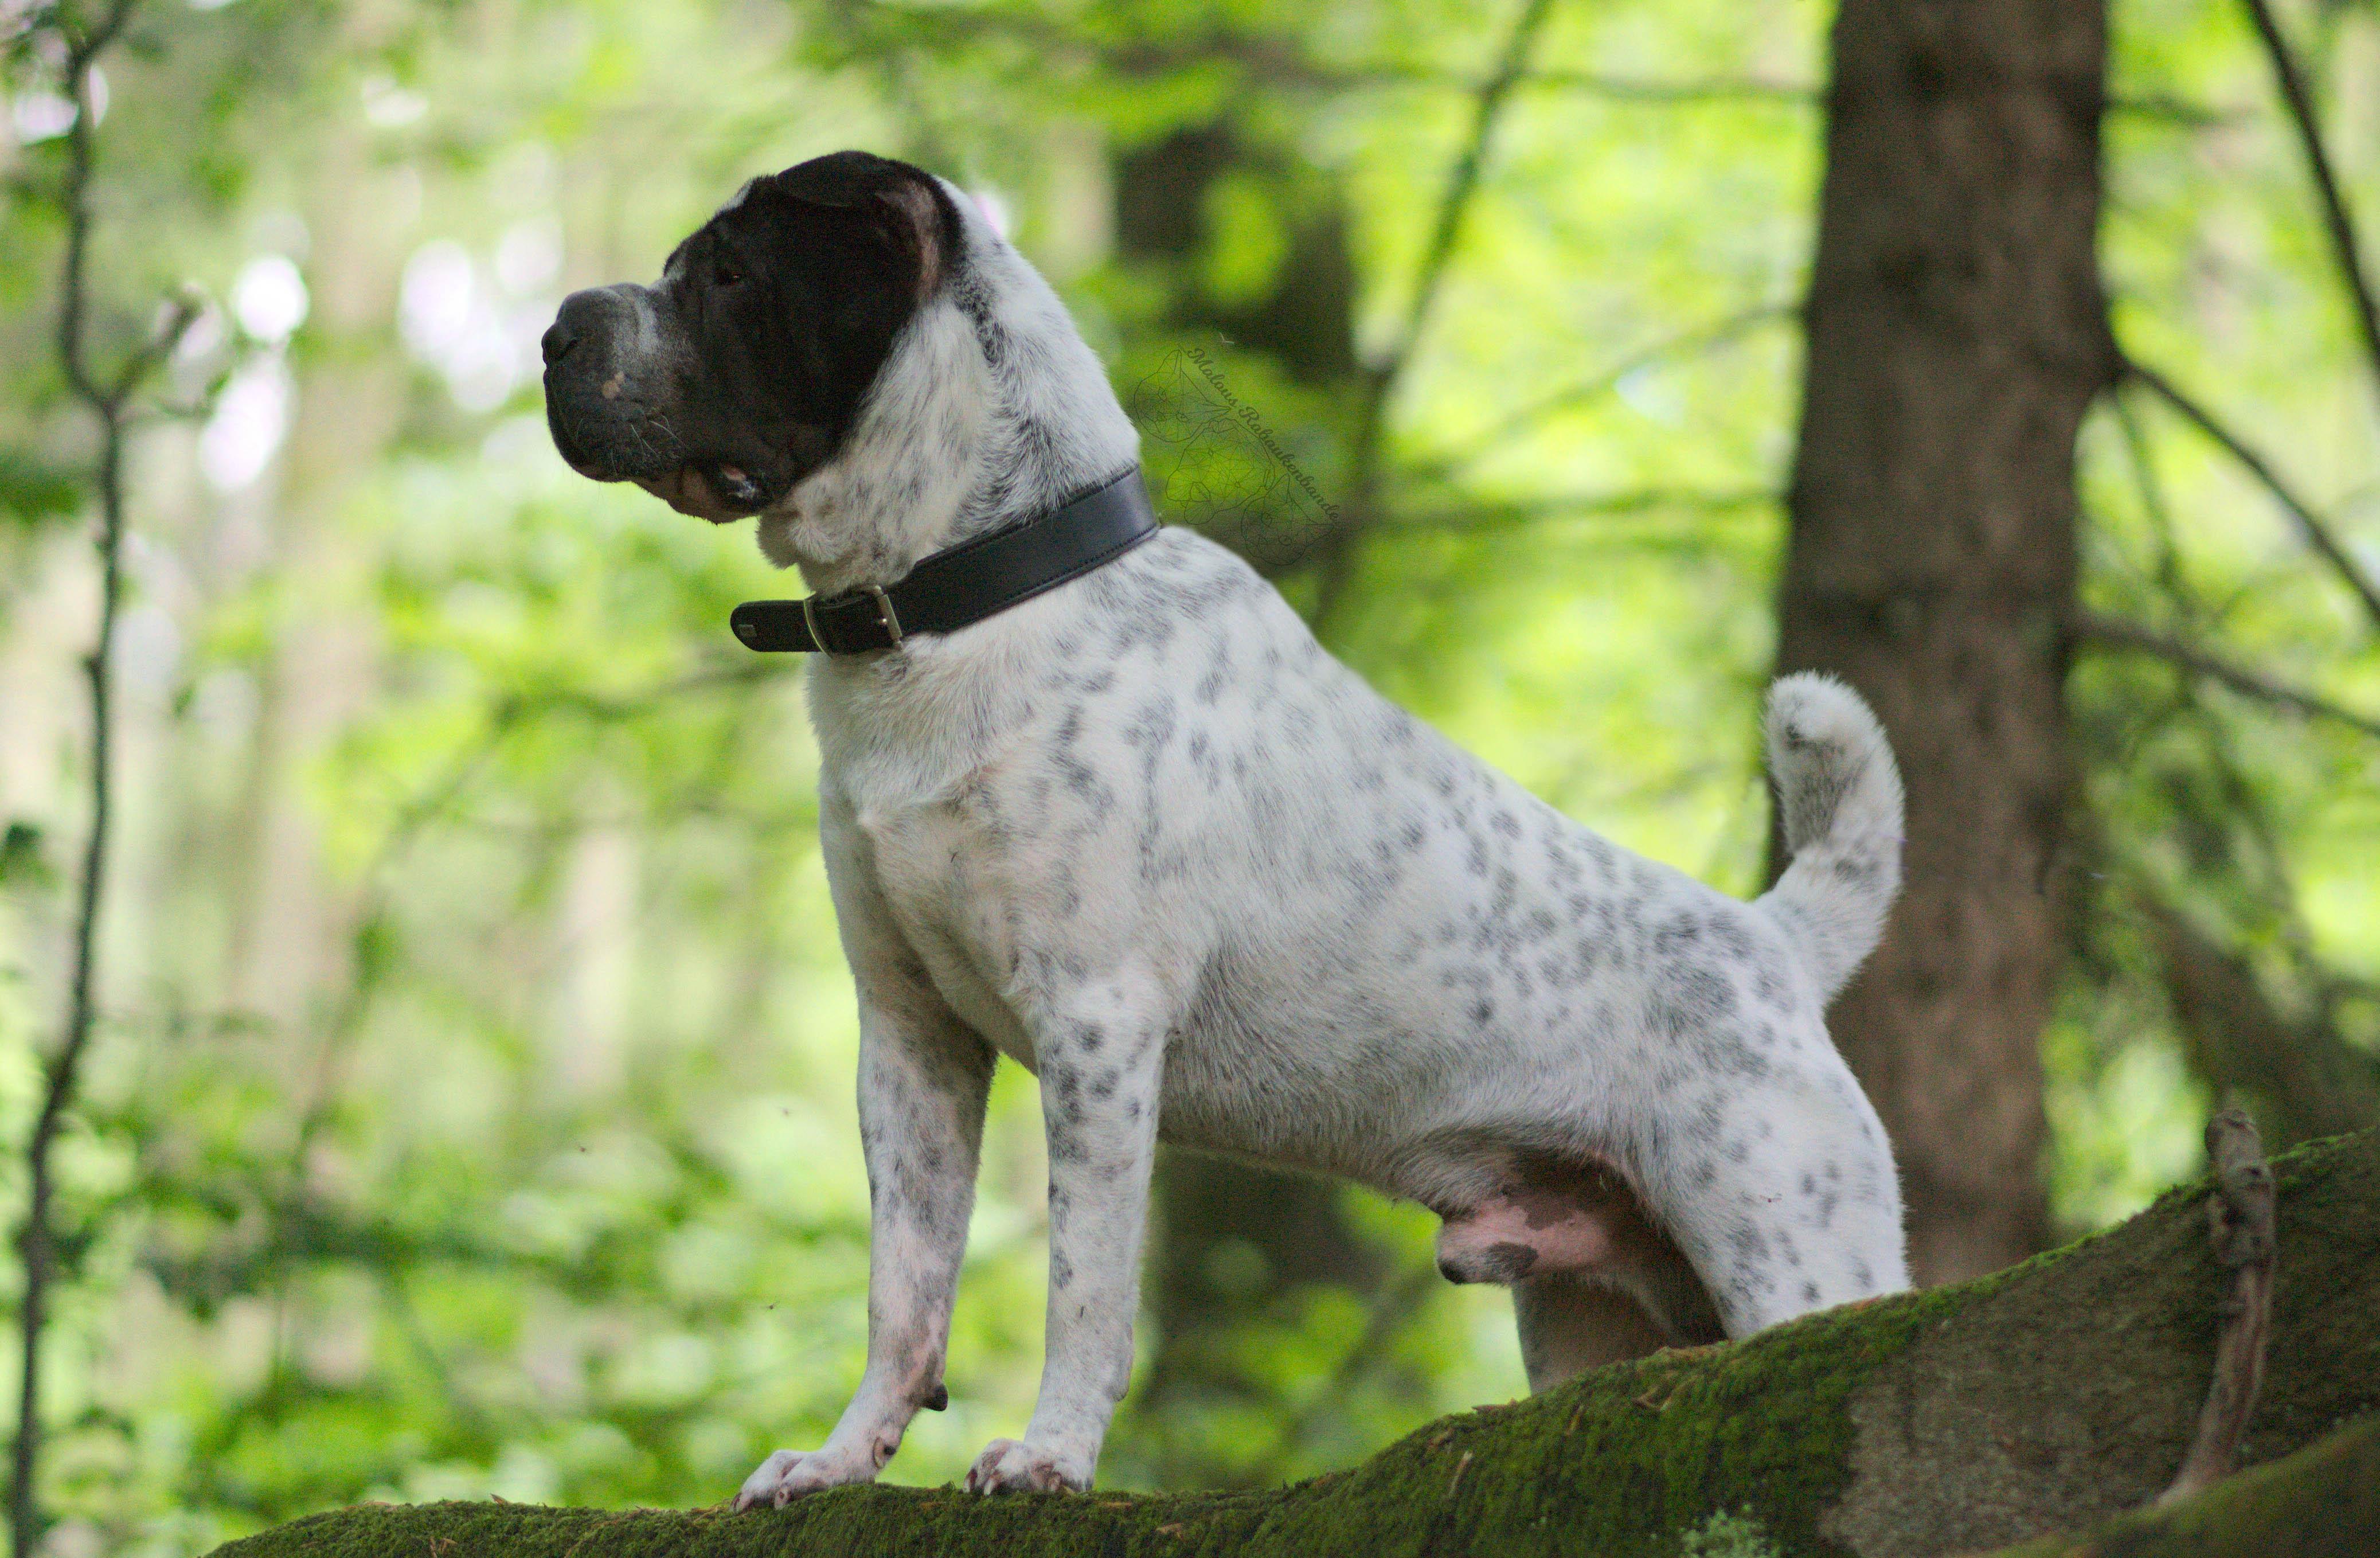 Wald Abenteuer Blog Hundeblog Hund Shar Pei Tagebuch Kingston Malous Rabaukenbande Blumen Arbeit Büro Spaziergang Hunde Tier Instagram Facebook Insekt Allergie Hannover Celle